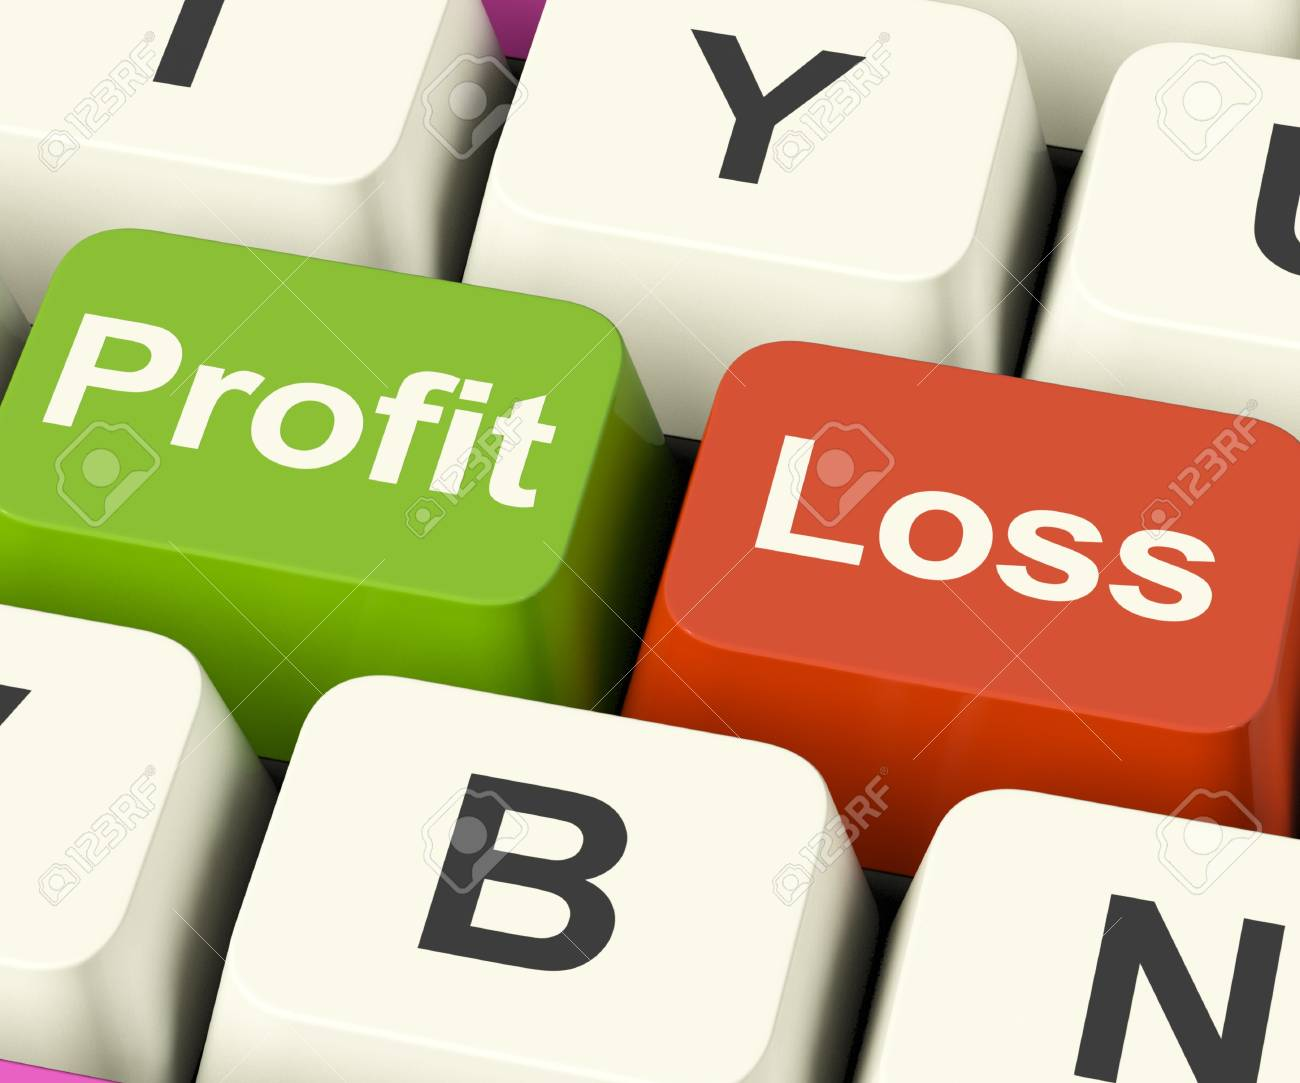 profit or loss keys showing returns for internet businesses stock